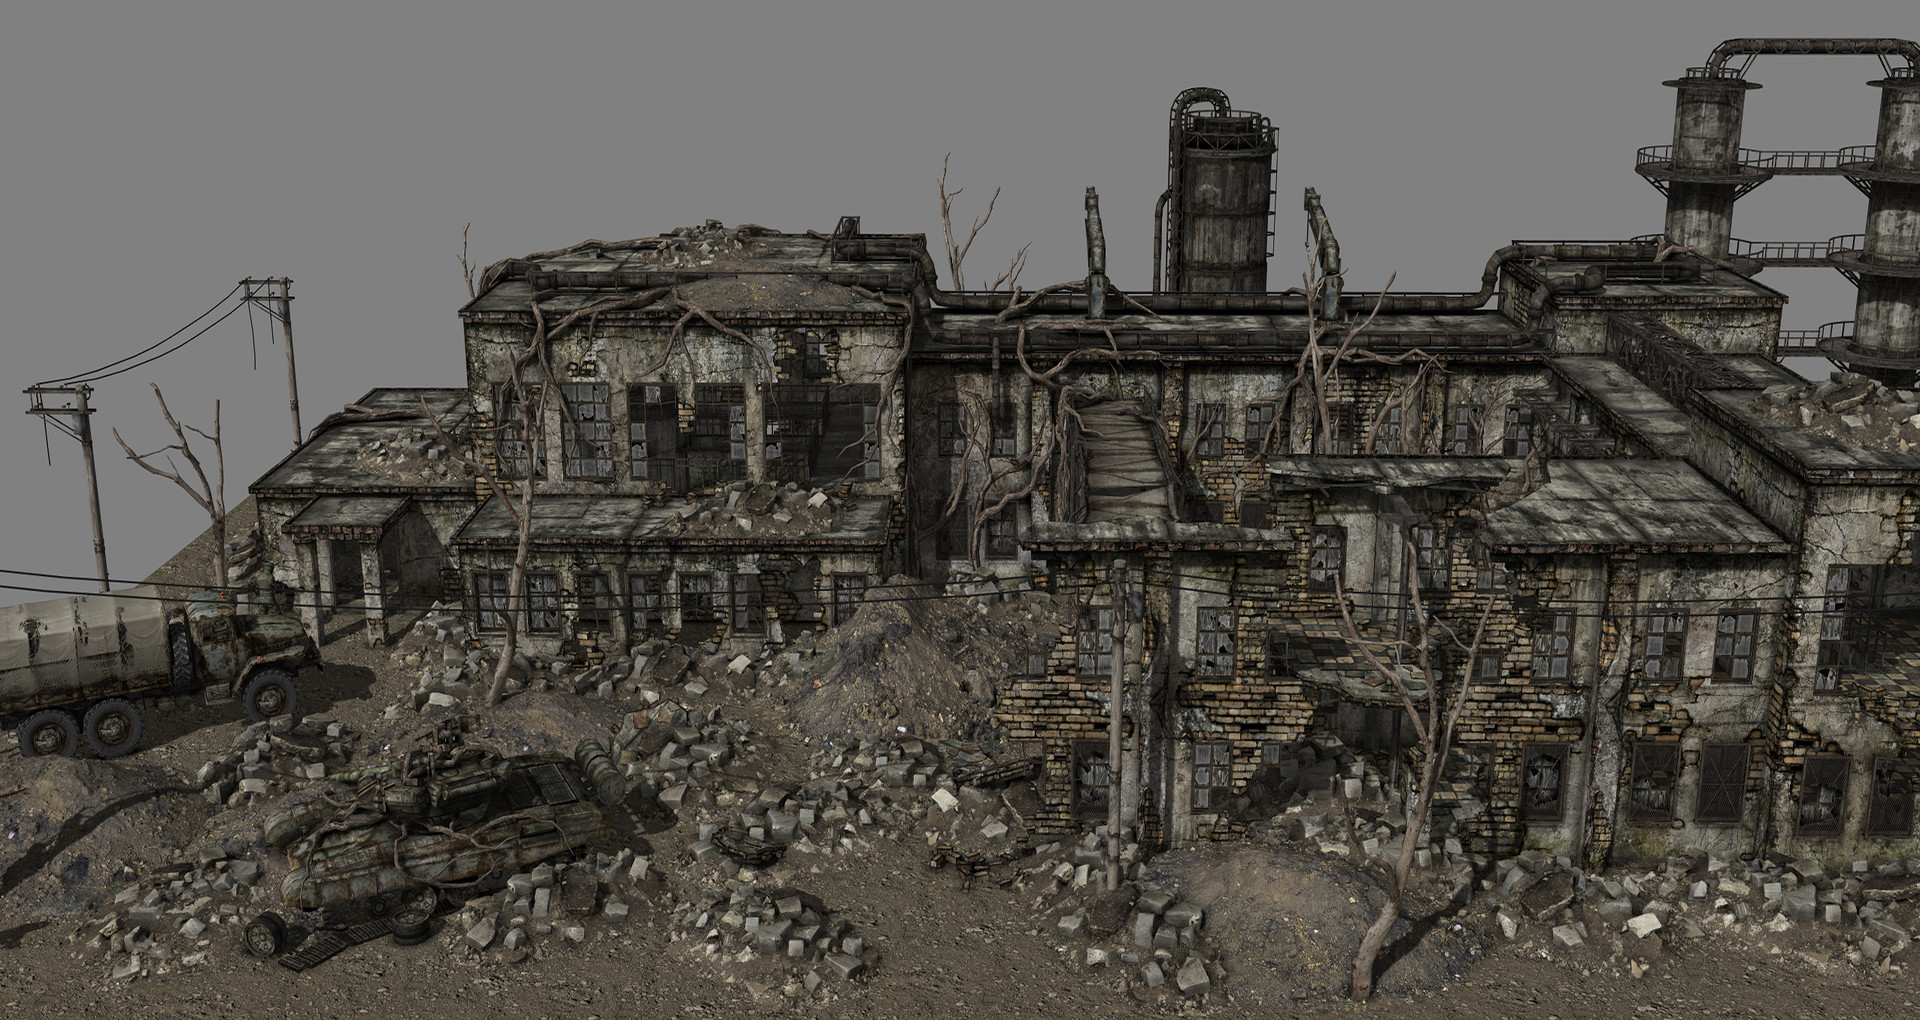 Robert max ramirez factoryscreenshots5